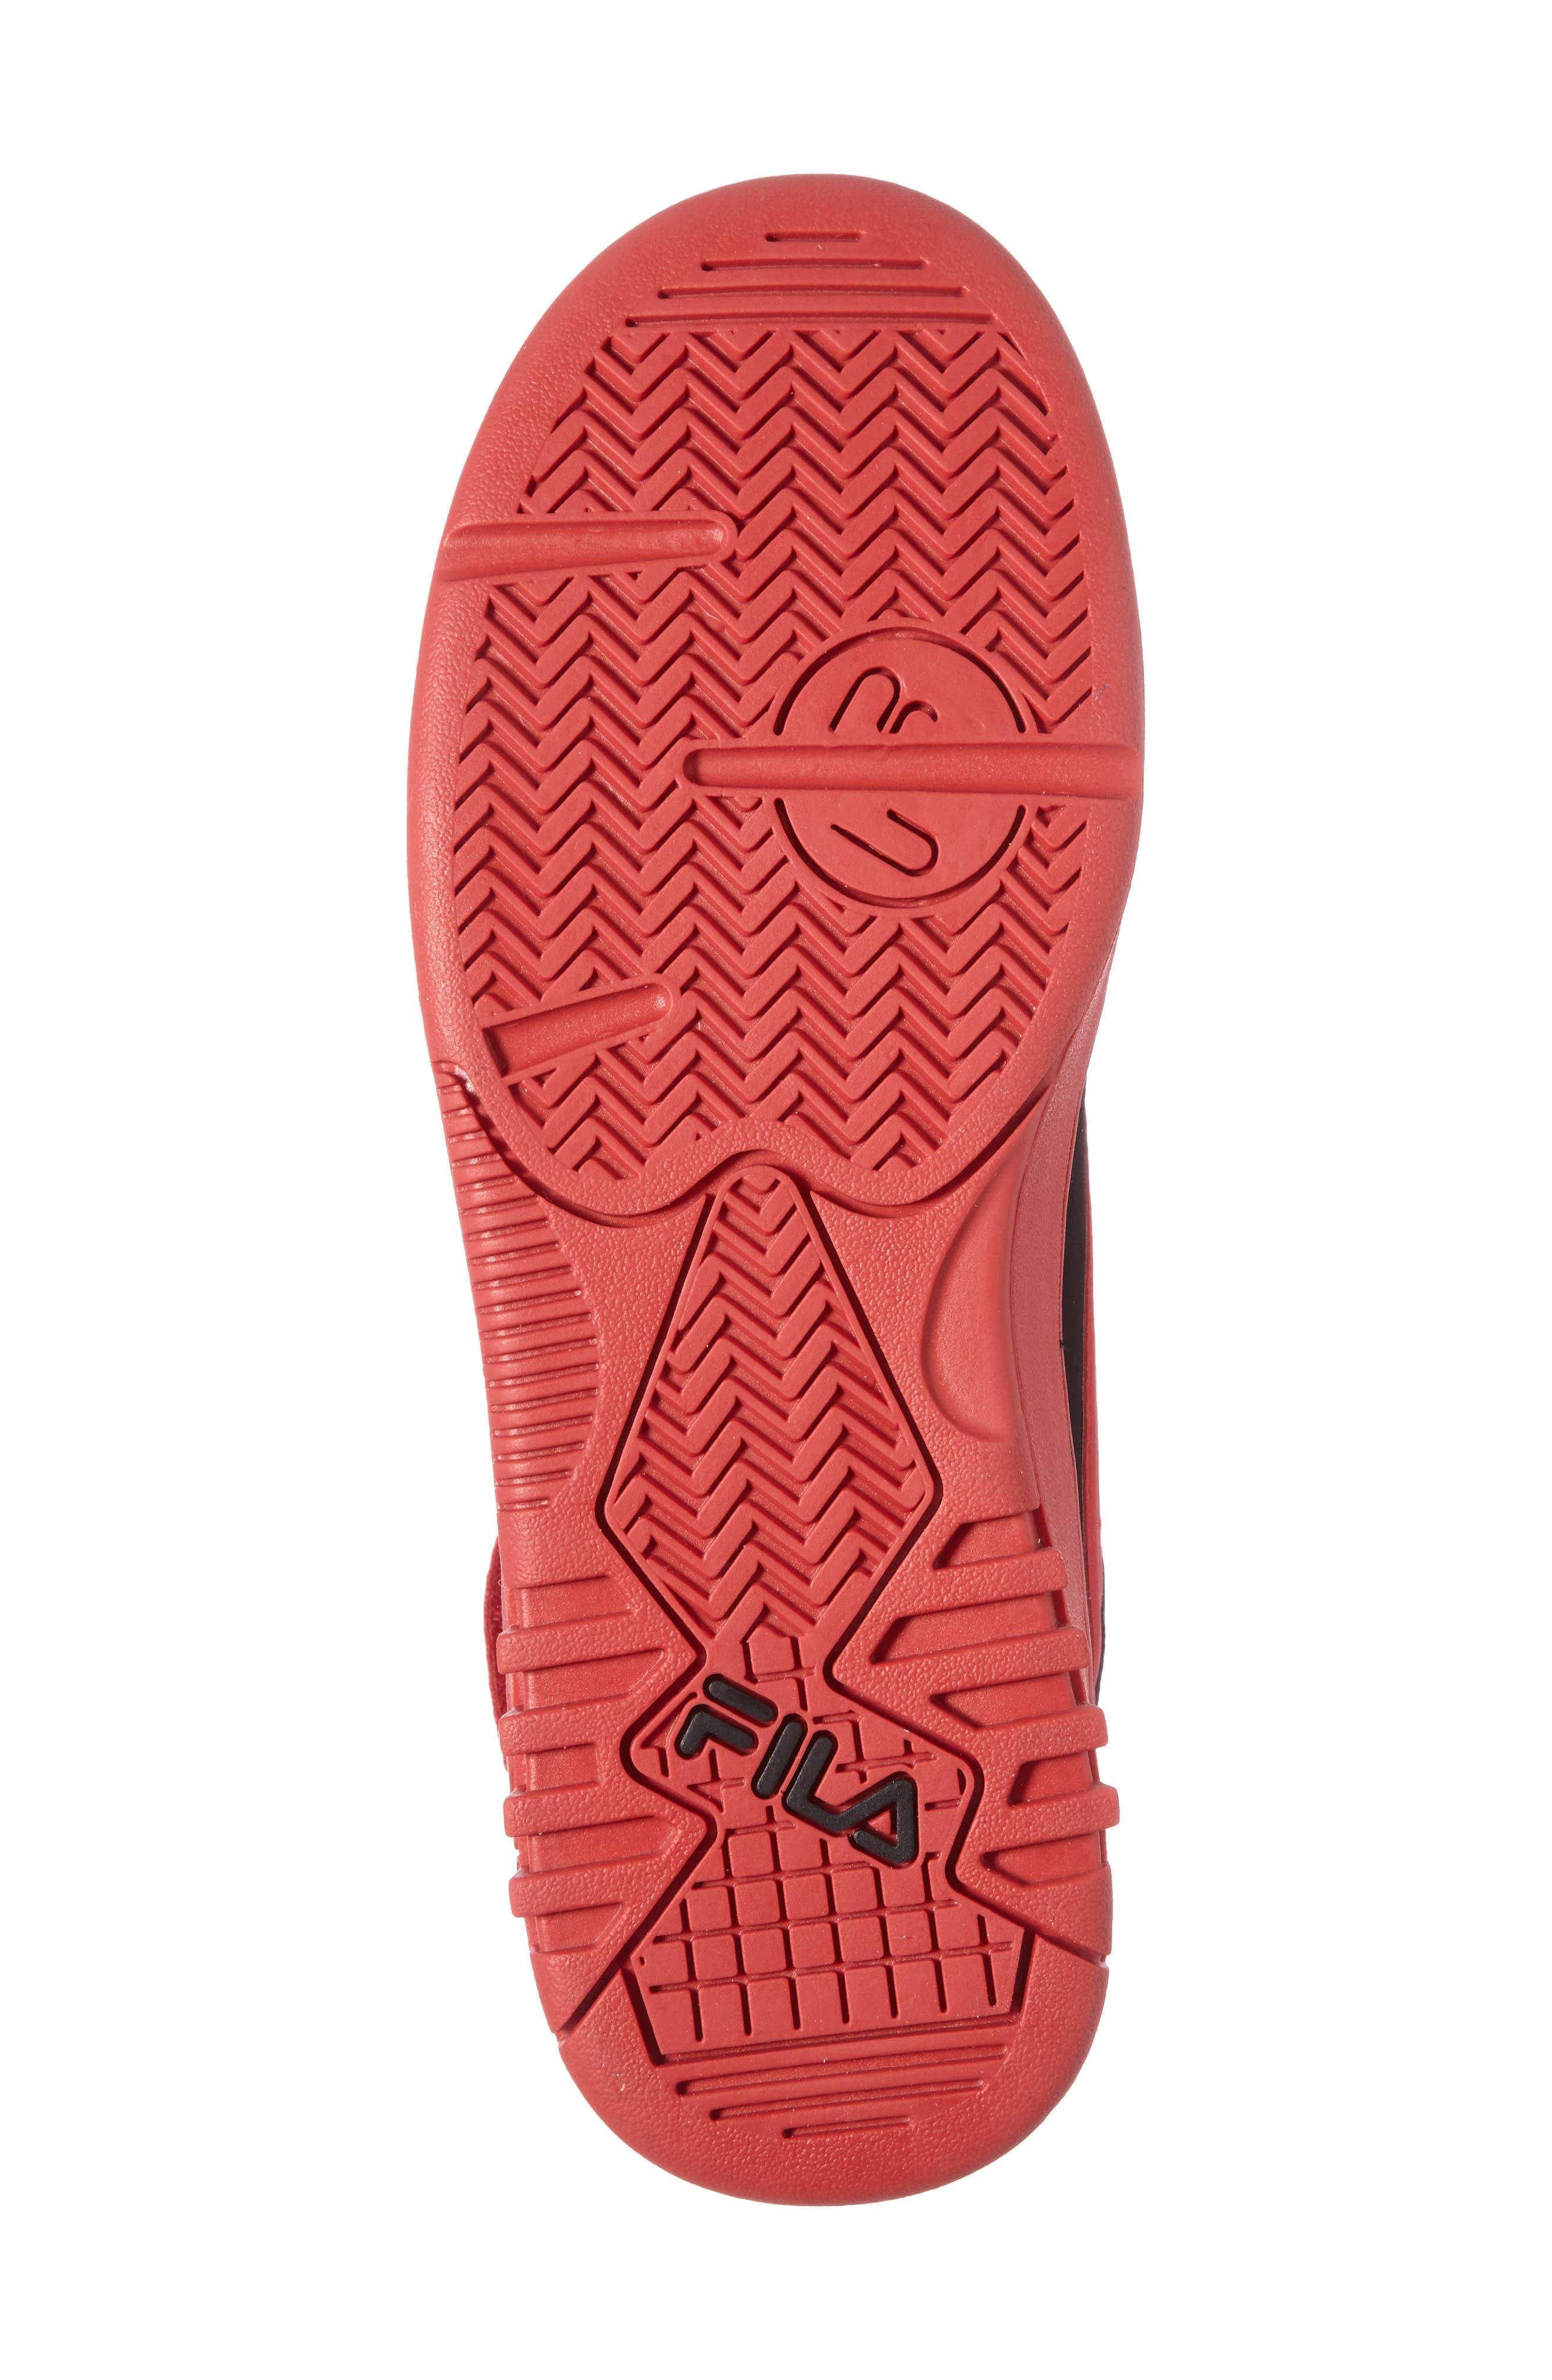 USA FX-100 High Top Sneaker,                             Alternate thumbnail 5, color,                             001